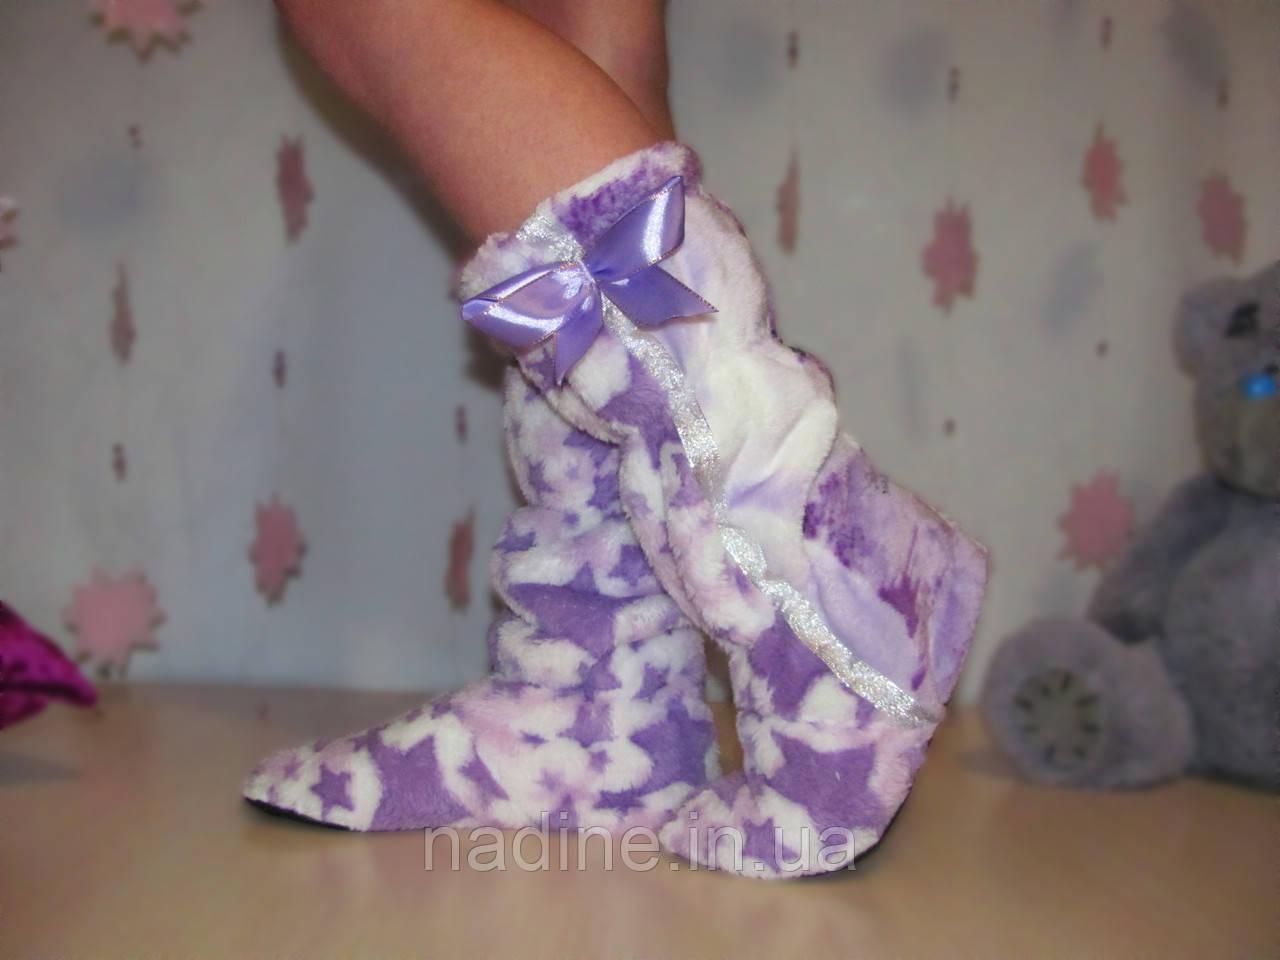 Сапожки Purple star для дома Eirena Nadine фиолетовые (S-412)  24см